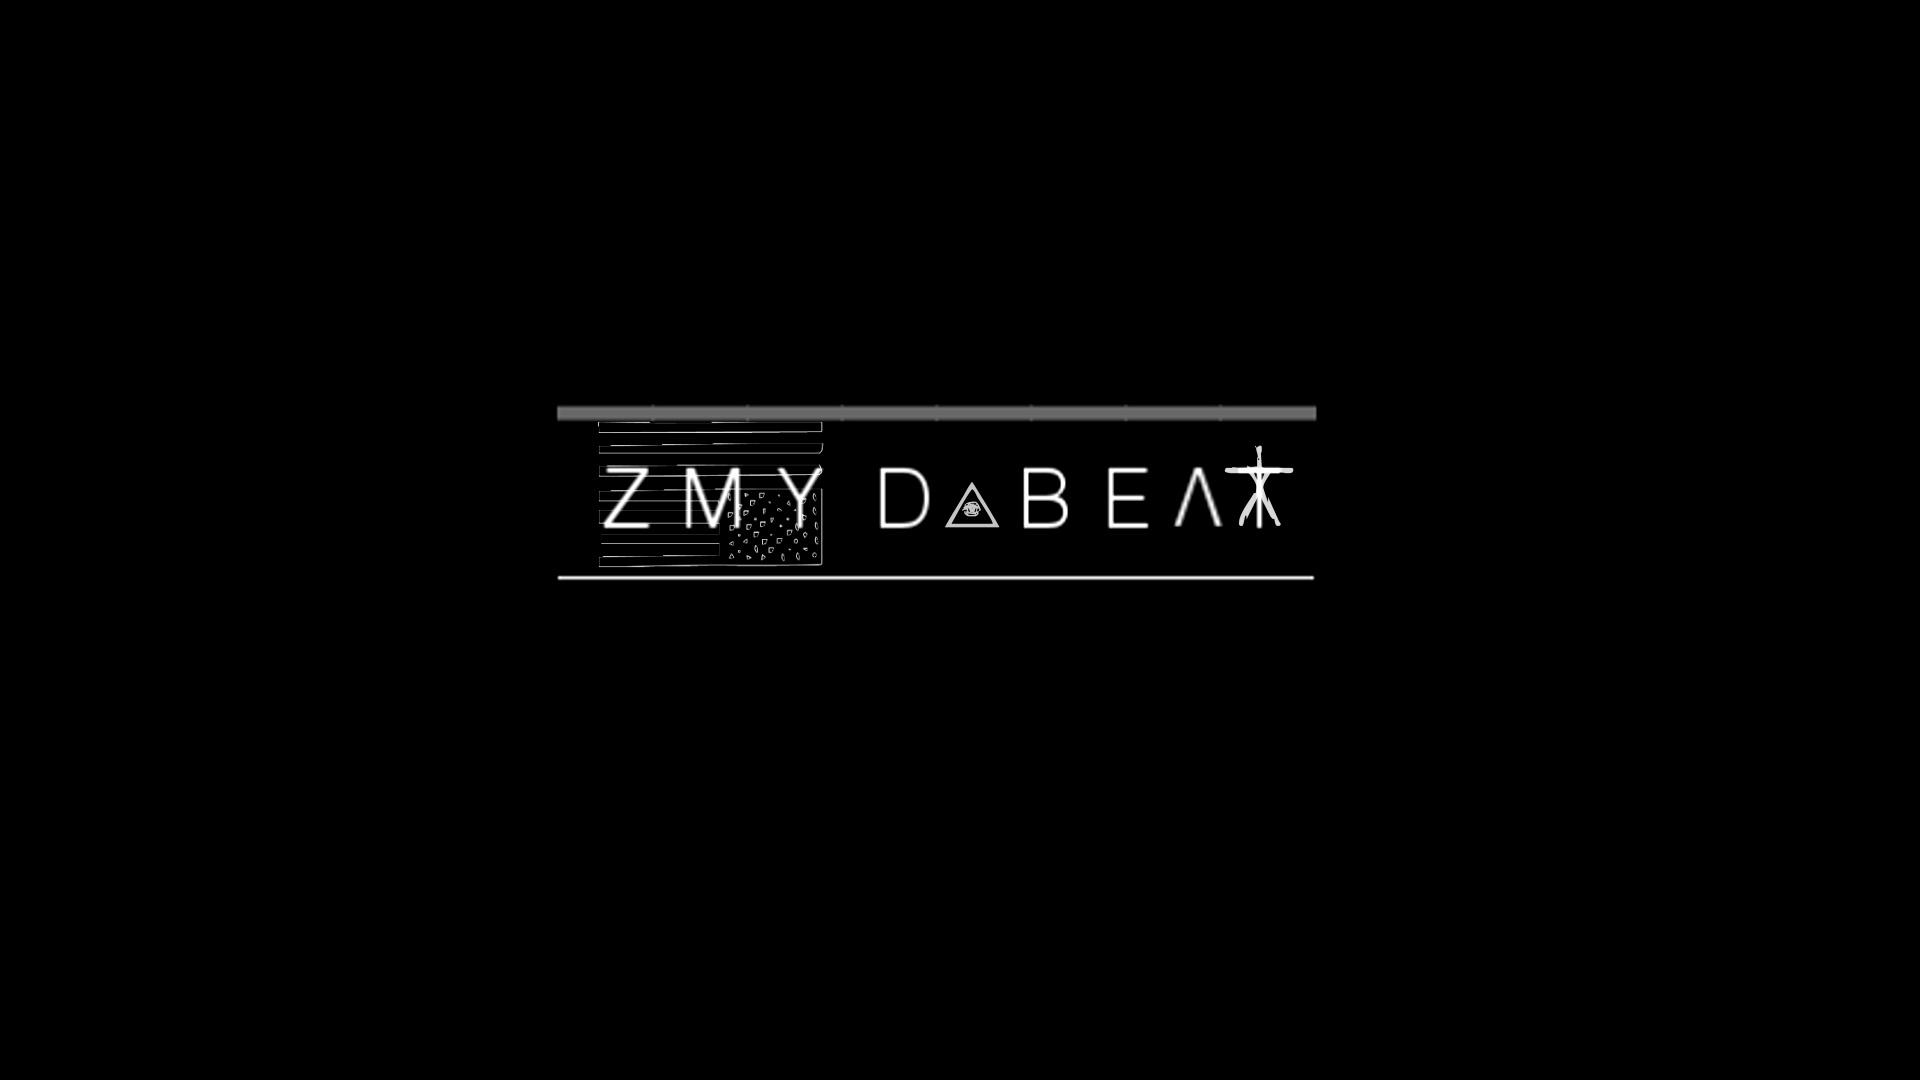 """S.E.C.T.O.R."" ►Hard Trap Rap Beat Instrumental Prod. by ZMY DaBeat"